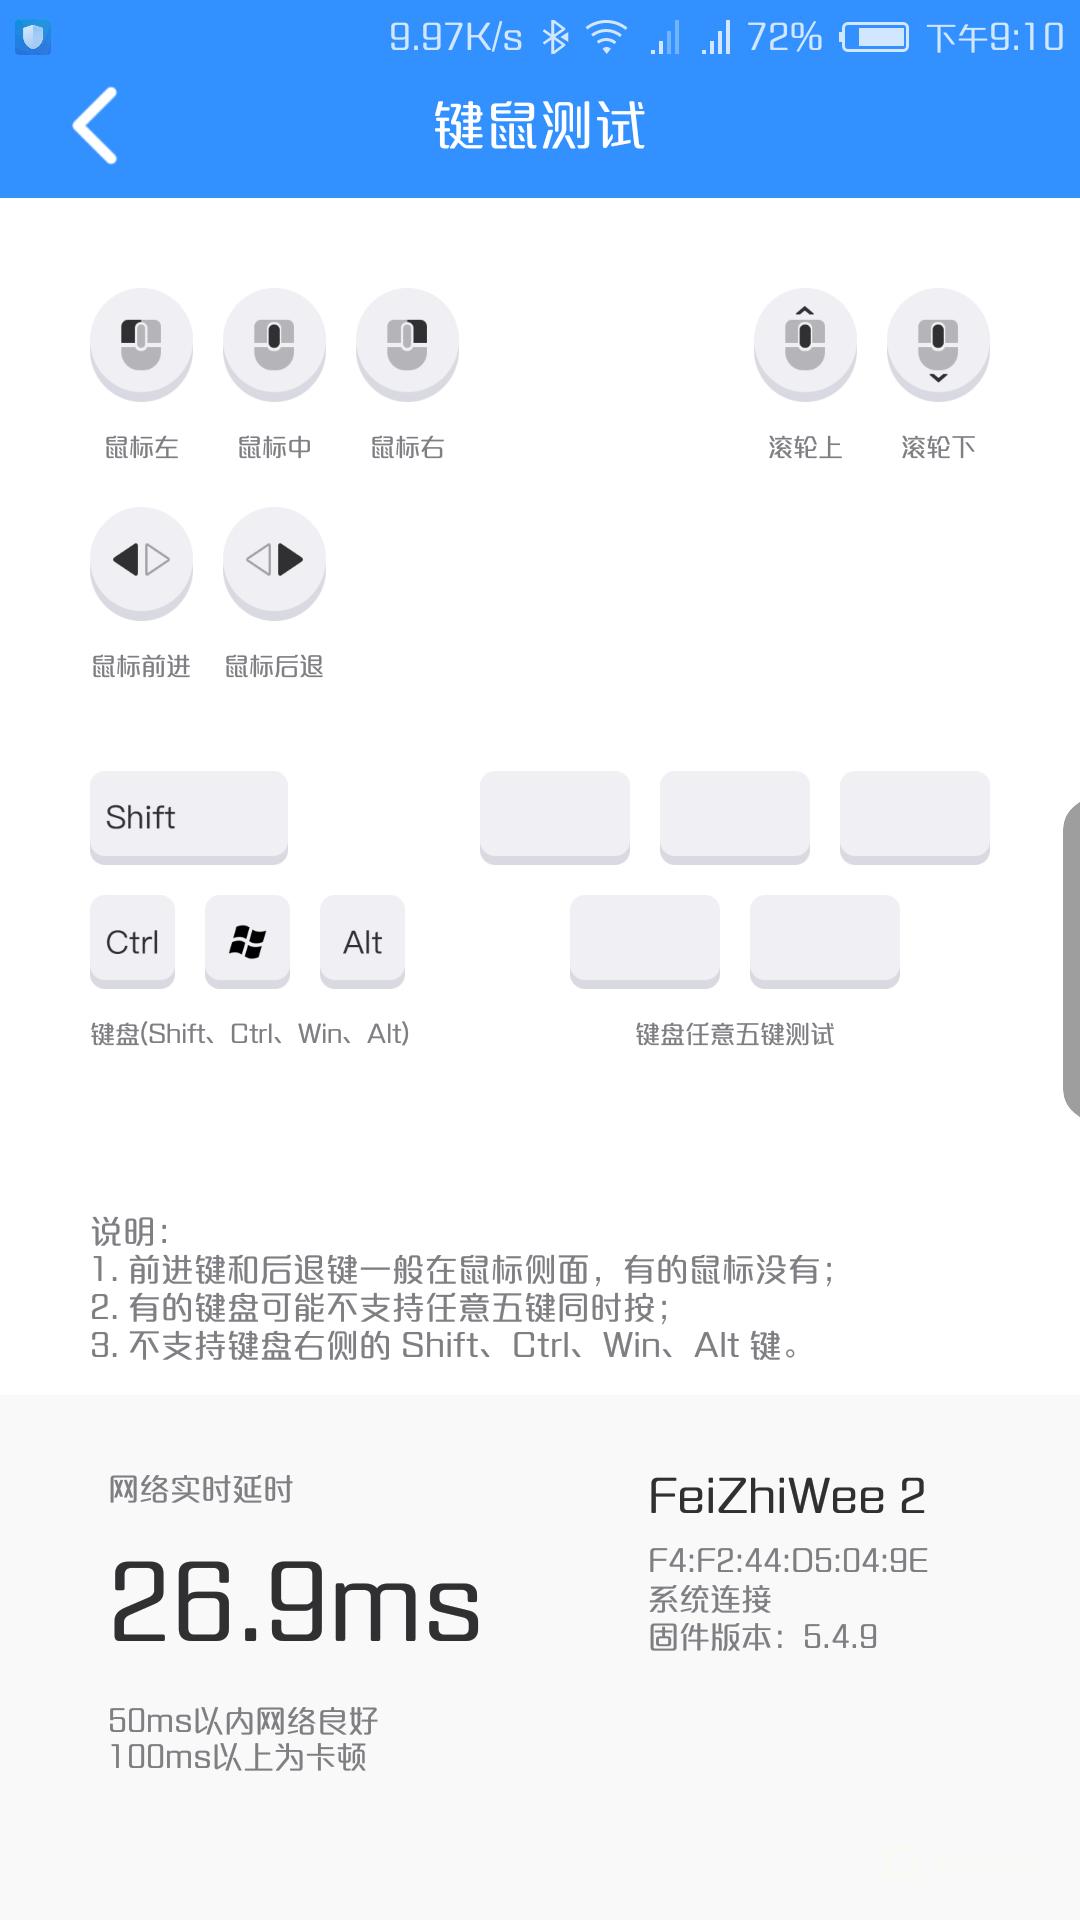 Screenshot_2018-06-09-21-10-01.png